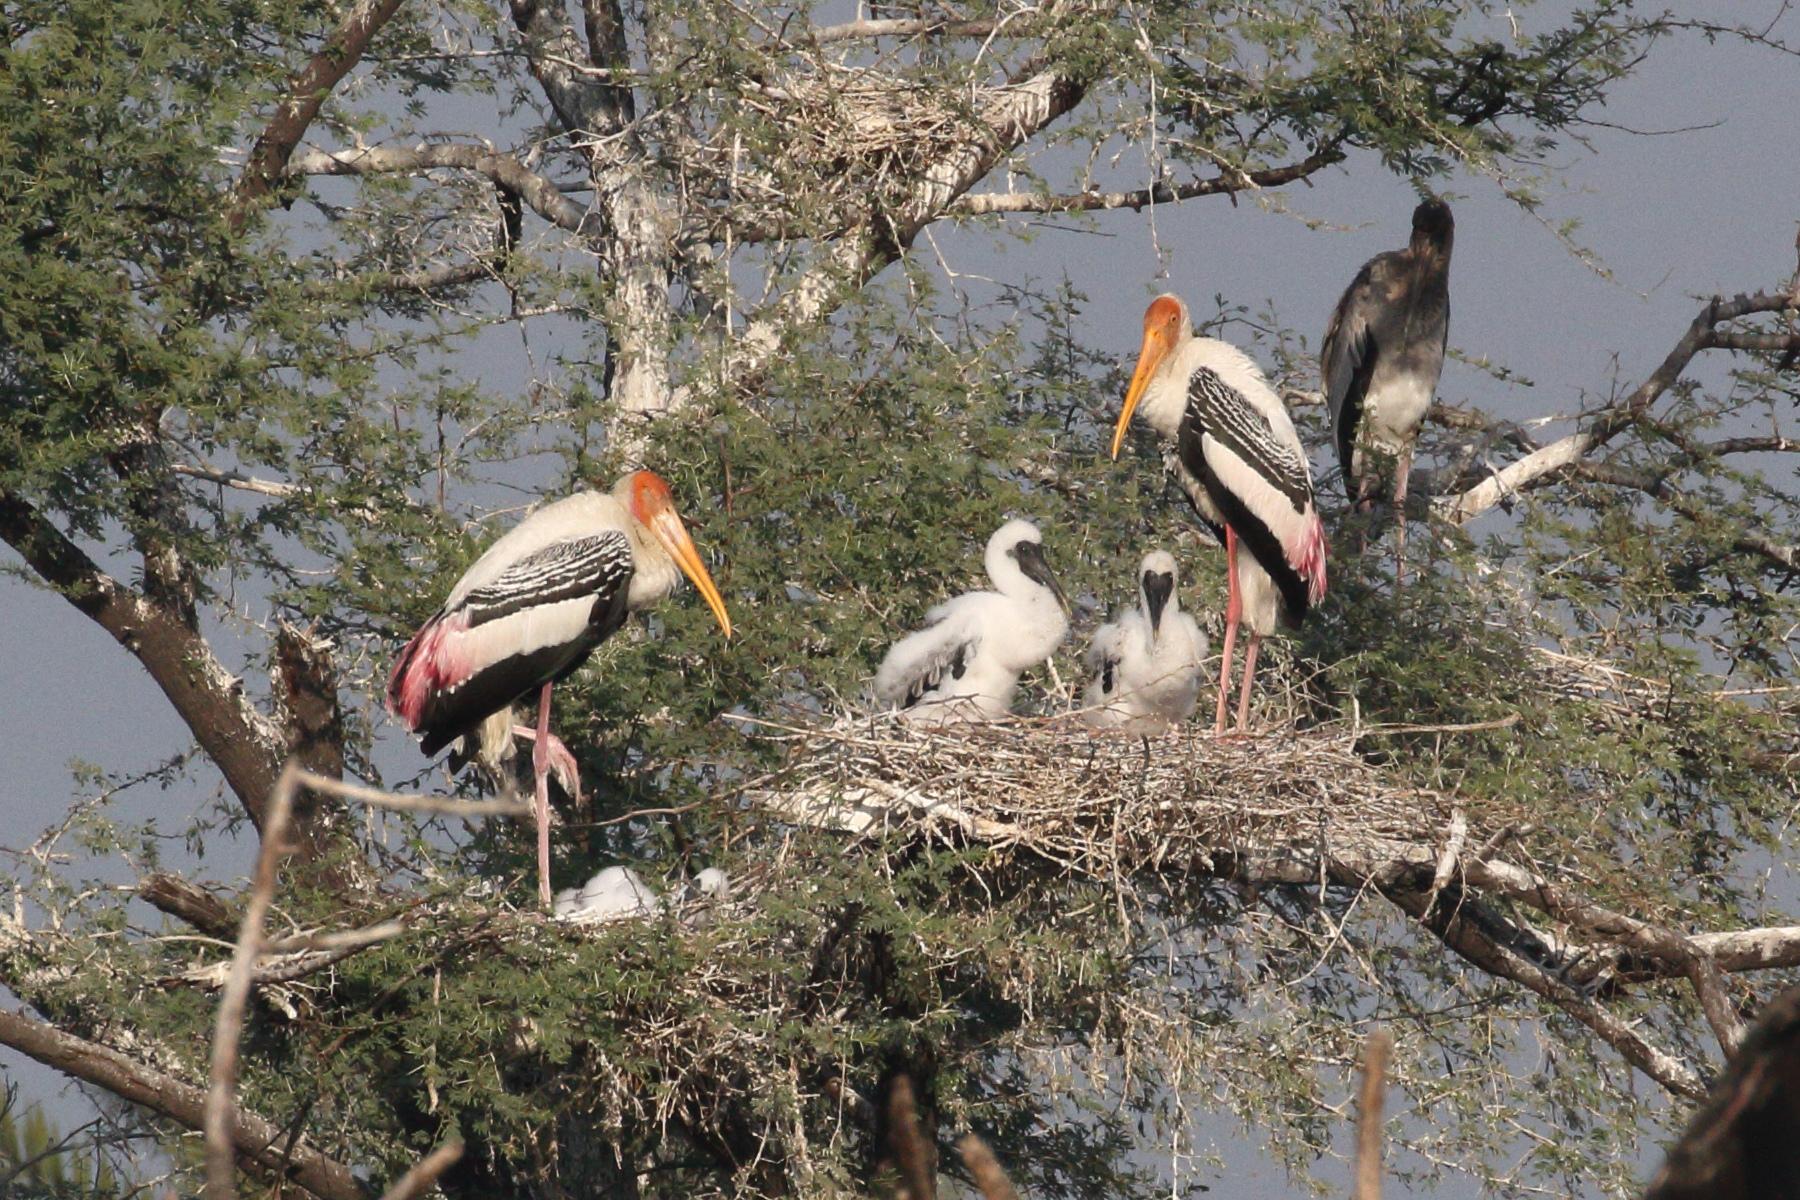 Down nestlings of Painted Stork